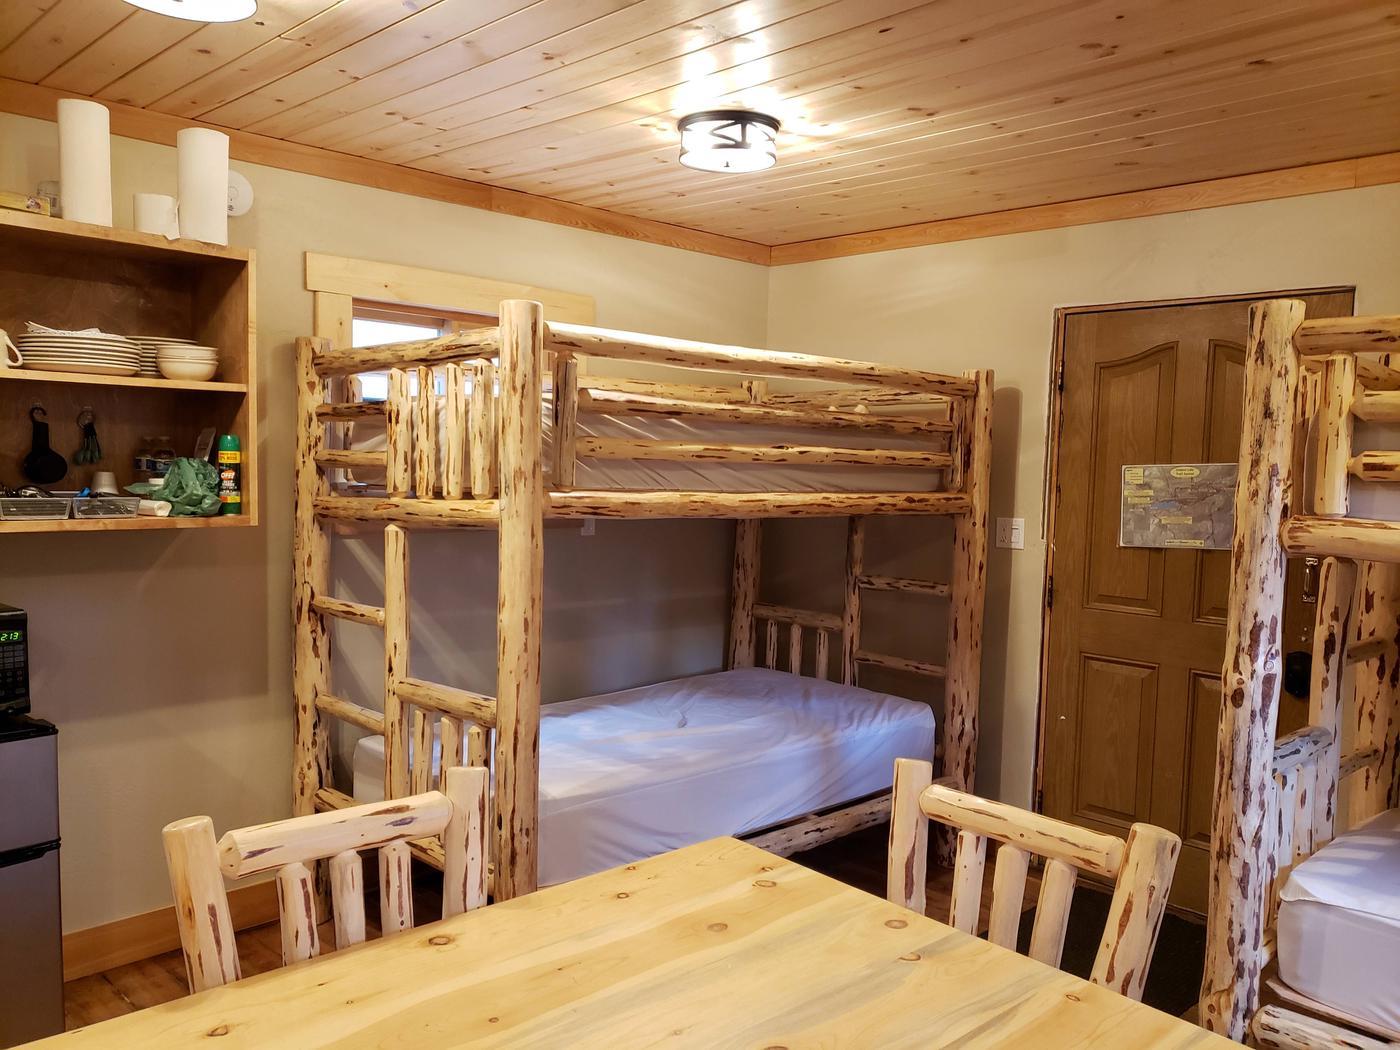 View of bunkbedsSouthwest Corner of Cabin